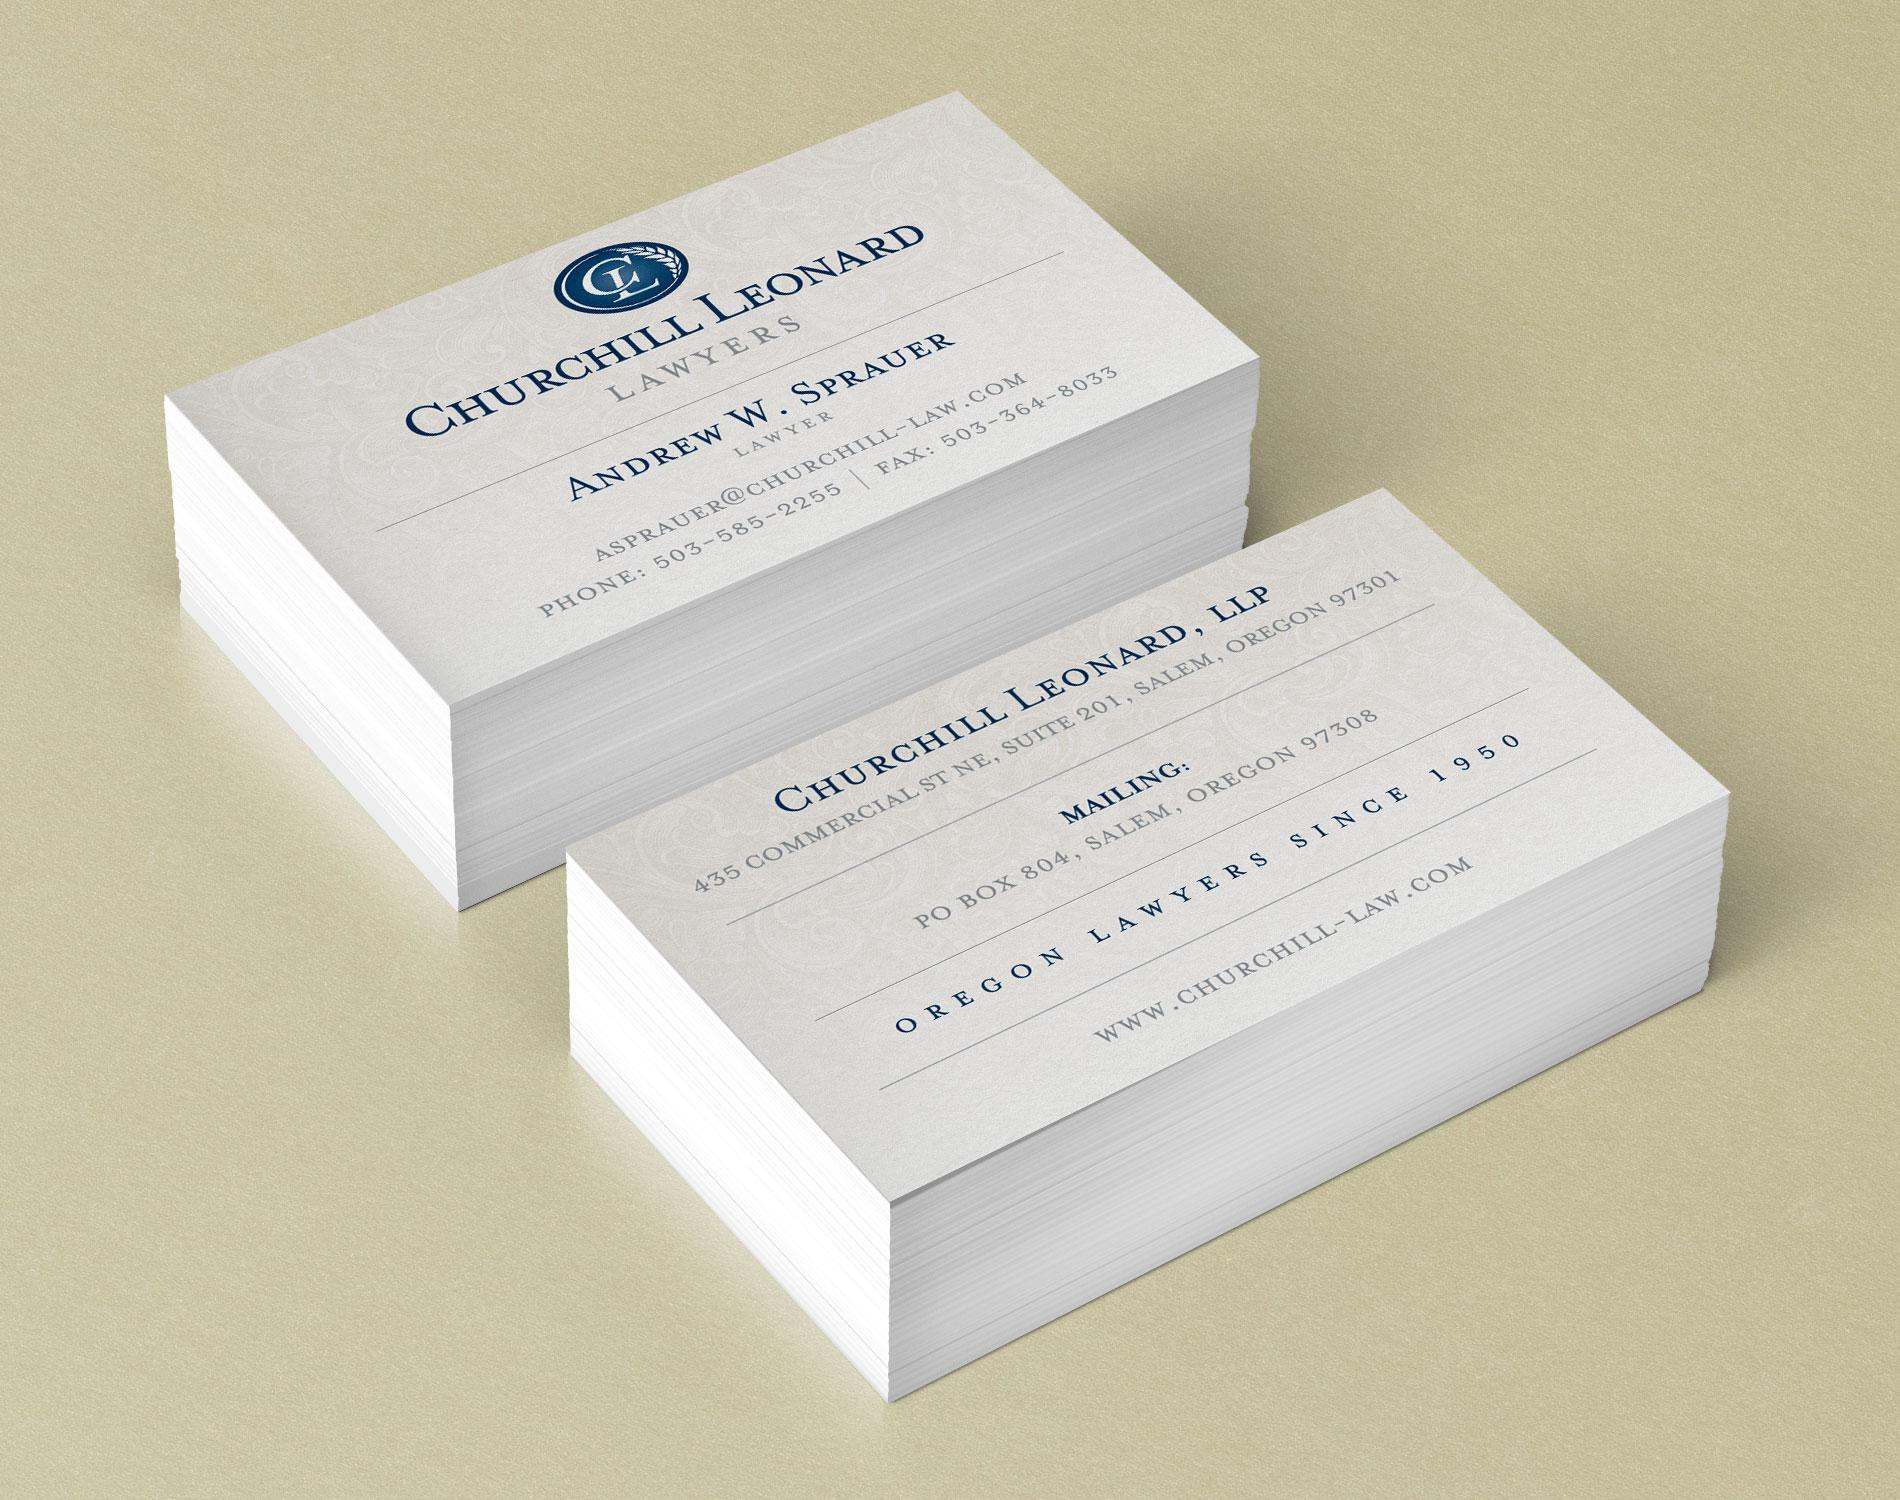 Churchill Leonard Lawyers - DesignPoint, Inc.